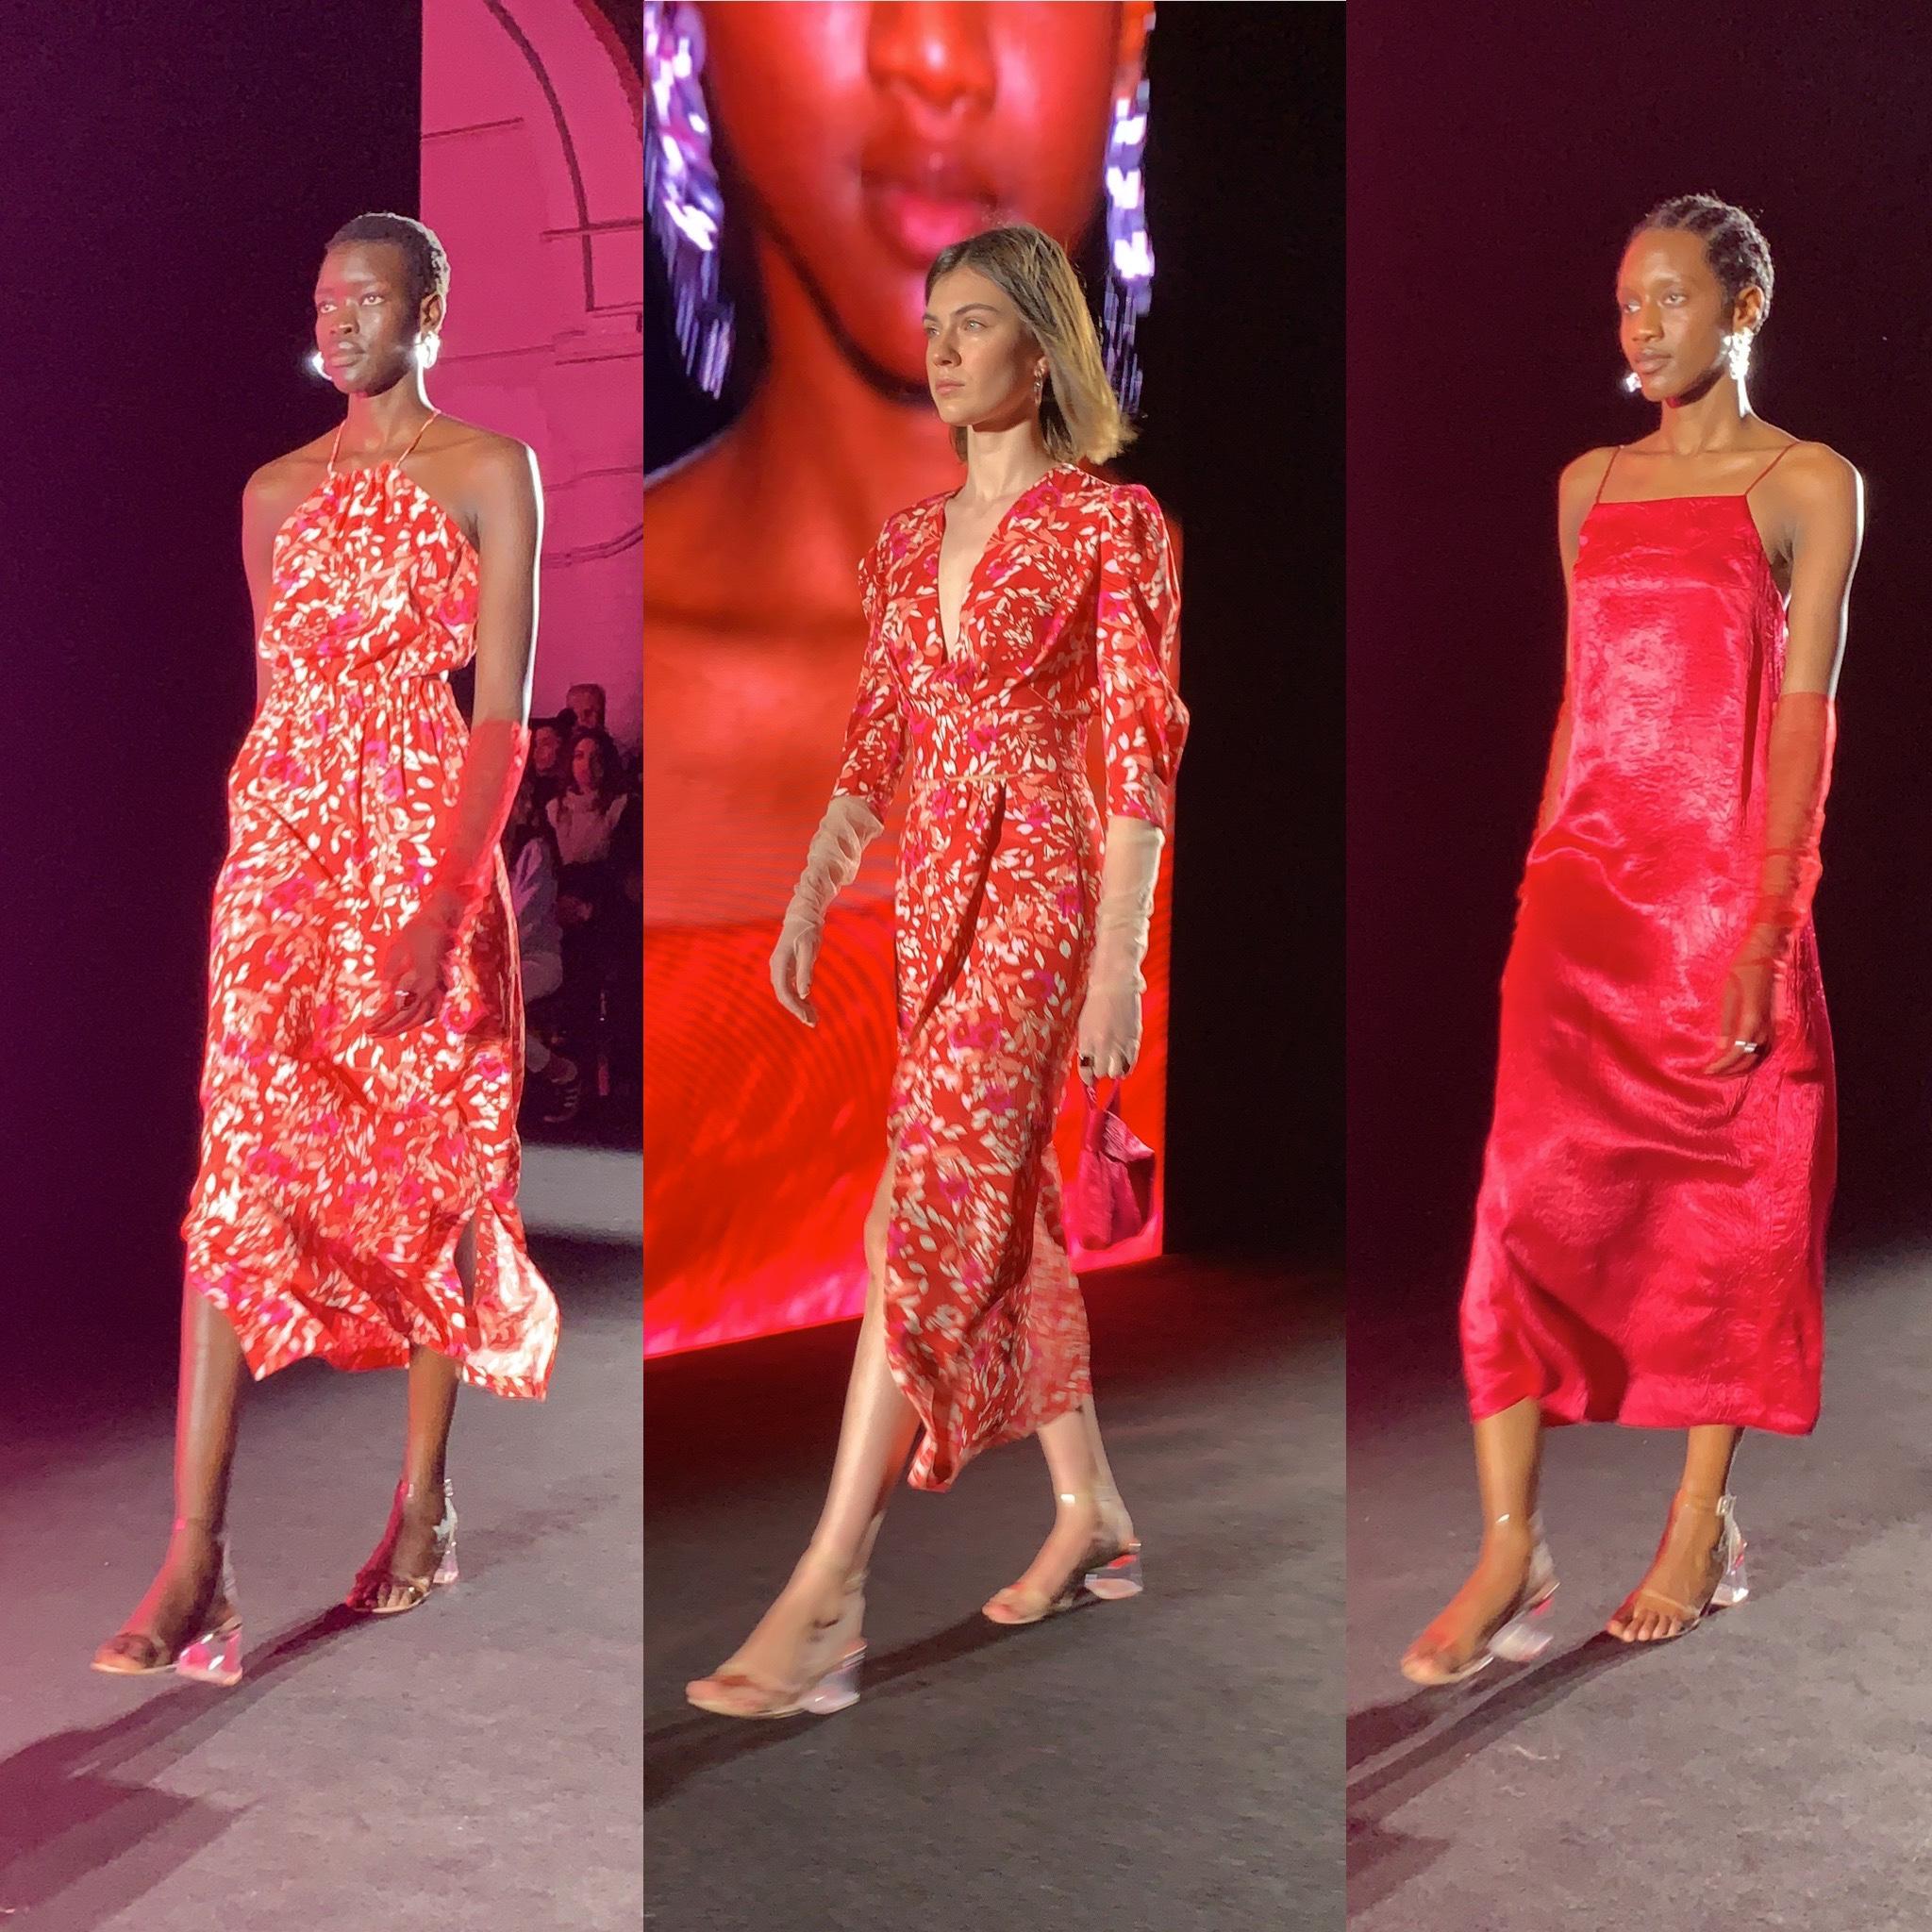 080-bcn-fashion-whynot-shopper-redactora-style-tendencias-pasarela-eiko-ai-barcelona-diseñadores